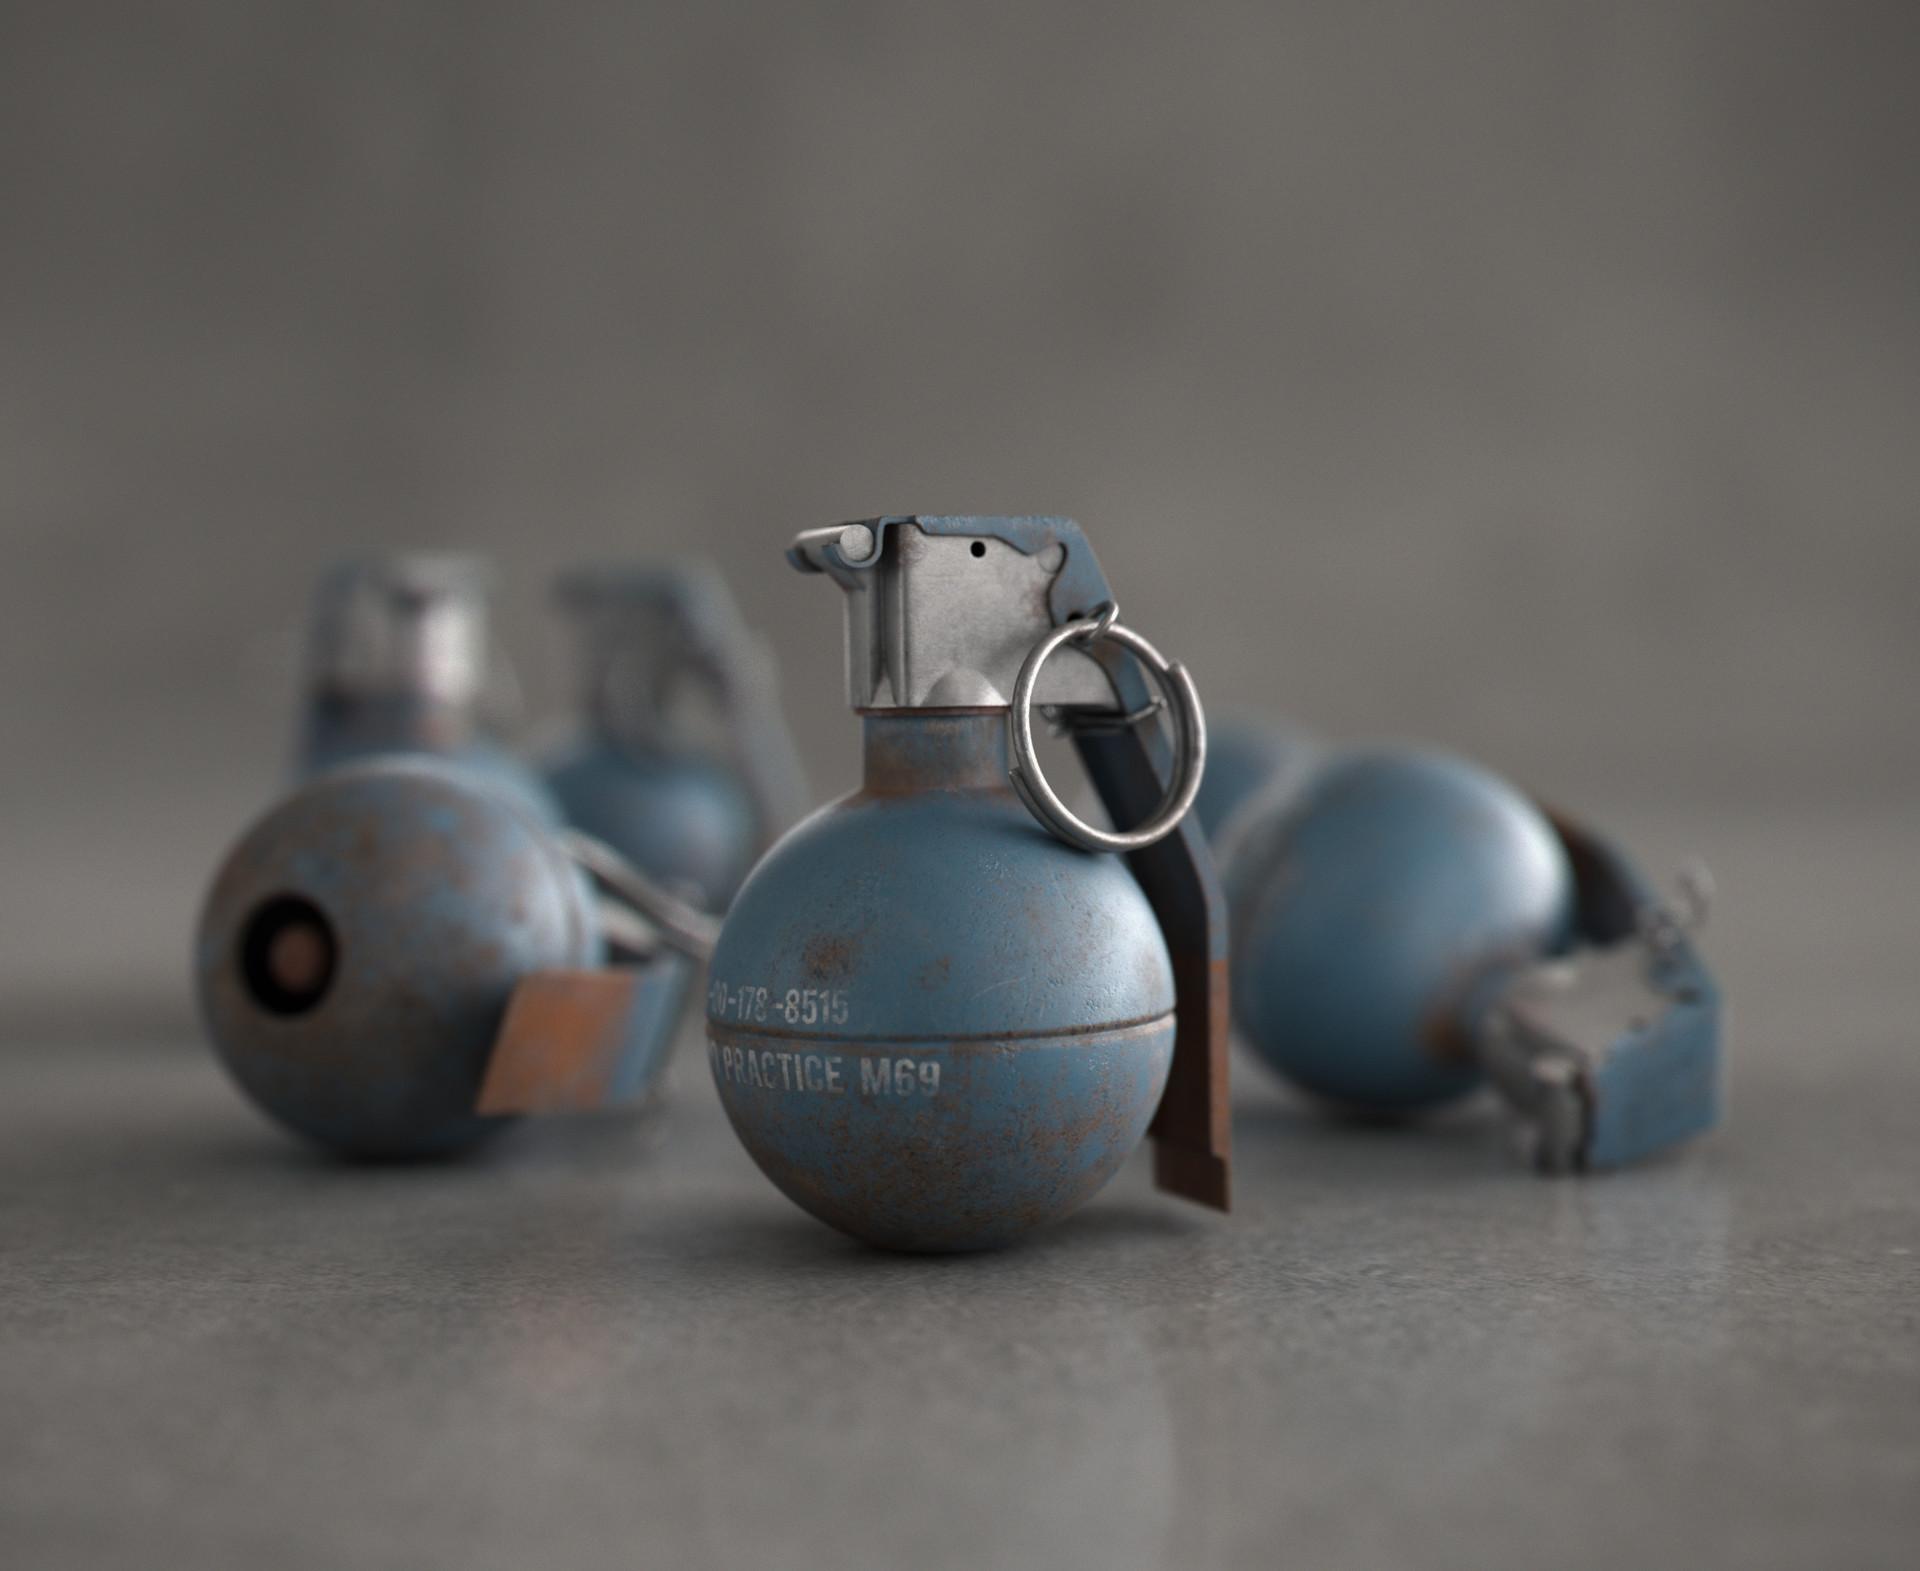 Felipe Ferreira - Grenade Hand Practice - M69   Studies #01